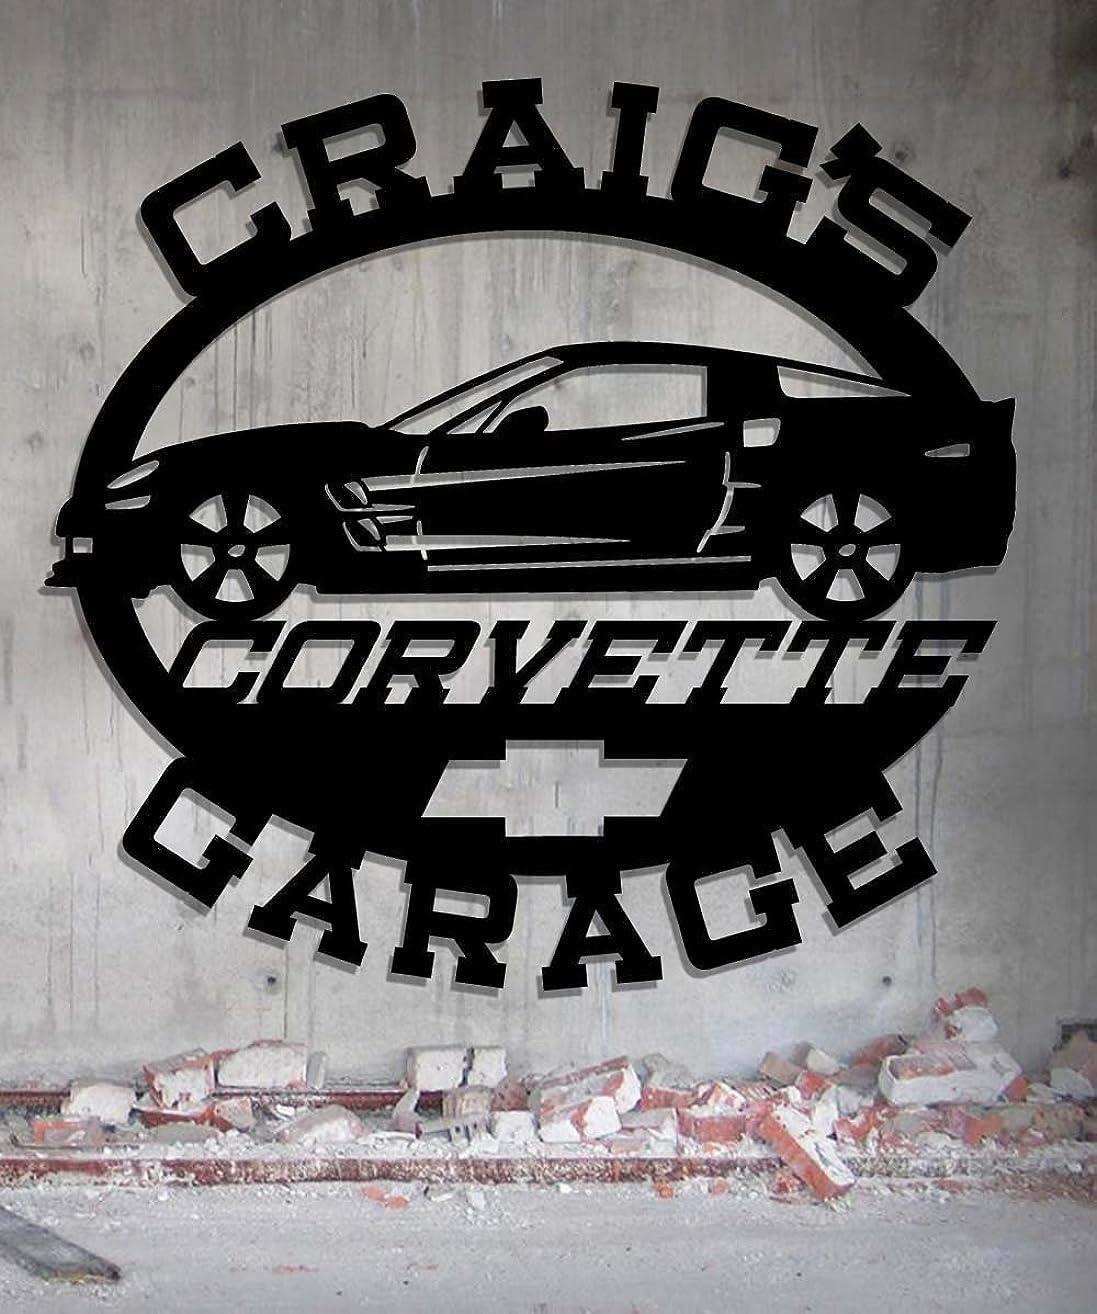 Corvette Garage - Personalized Metal Sign - Metal Wall Art -Customize It - Metal Wall Art Man Cave Gift Grandpa's Dad's Or Custom Name 23.5 Wide x 22.75 Tall